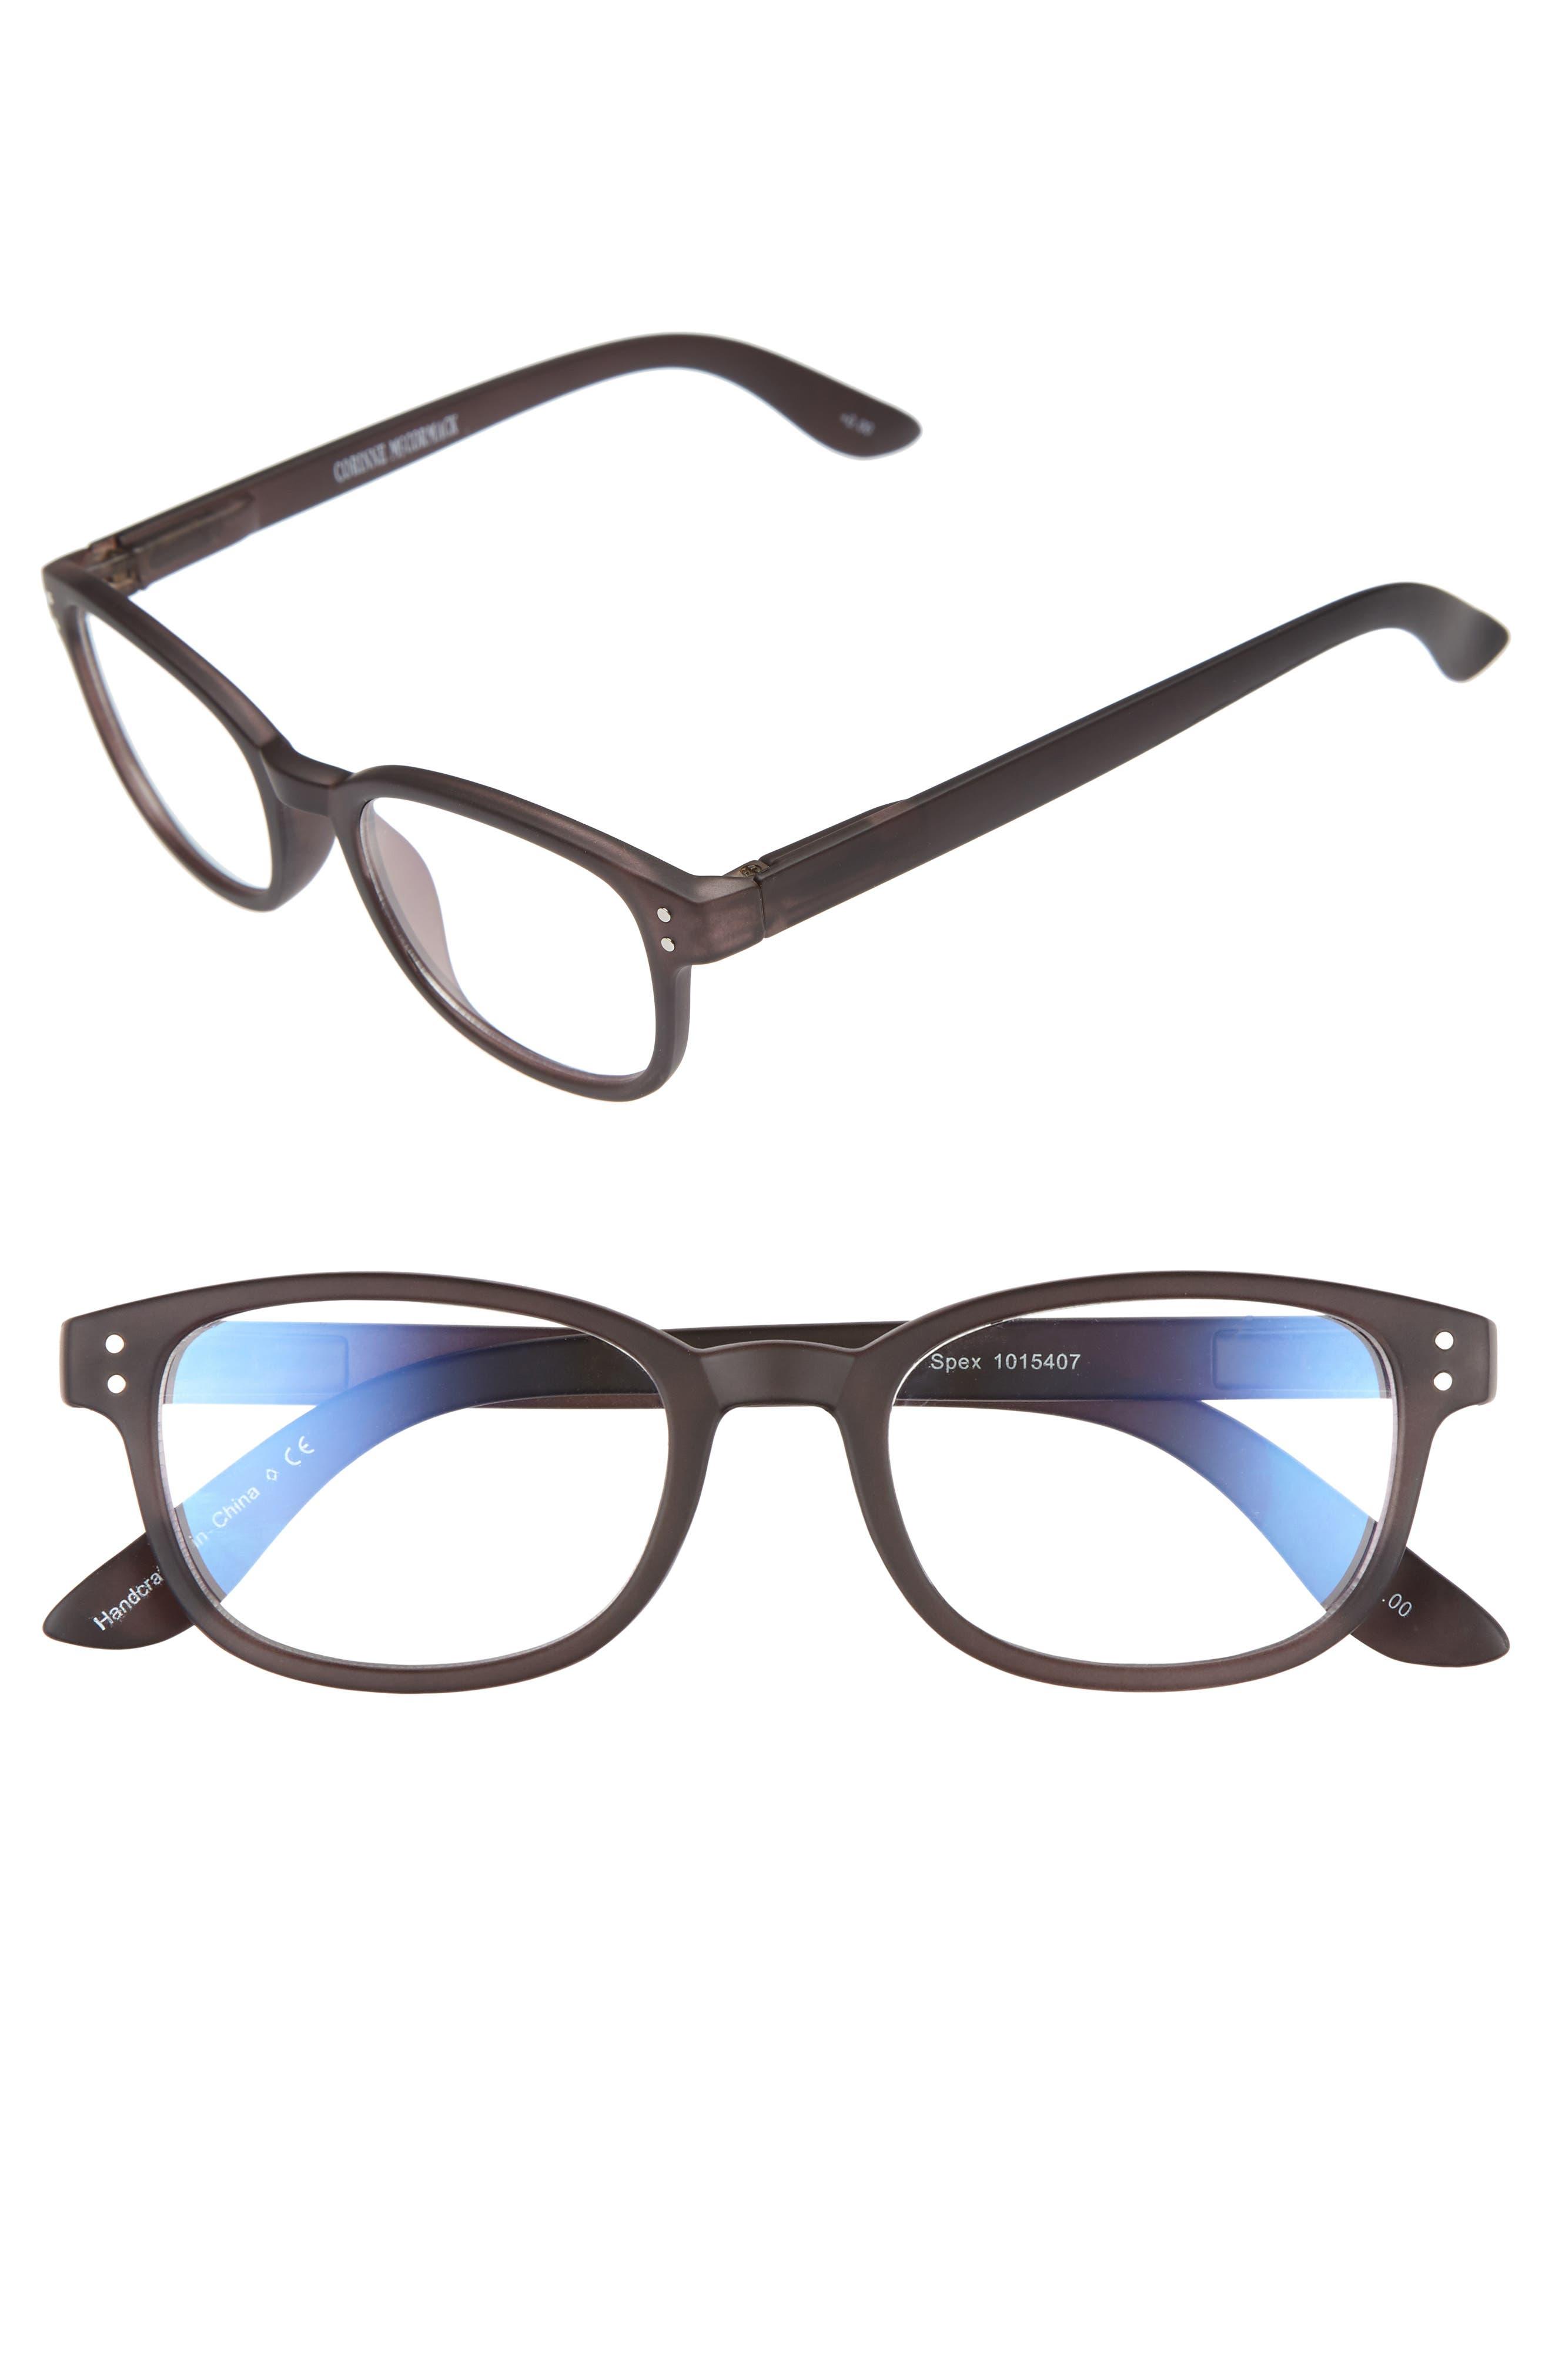 CORINNE MCCORMACK ColorSpex<sup>®</sup> 50mm Blue Light Blocking Reading Glasses, Main, color, BLACK